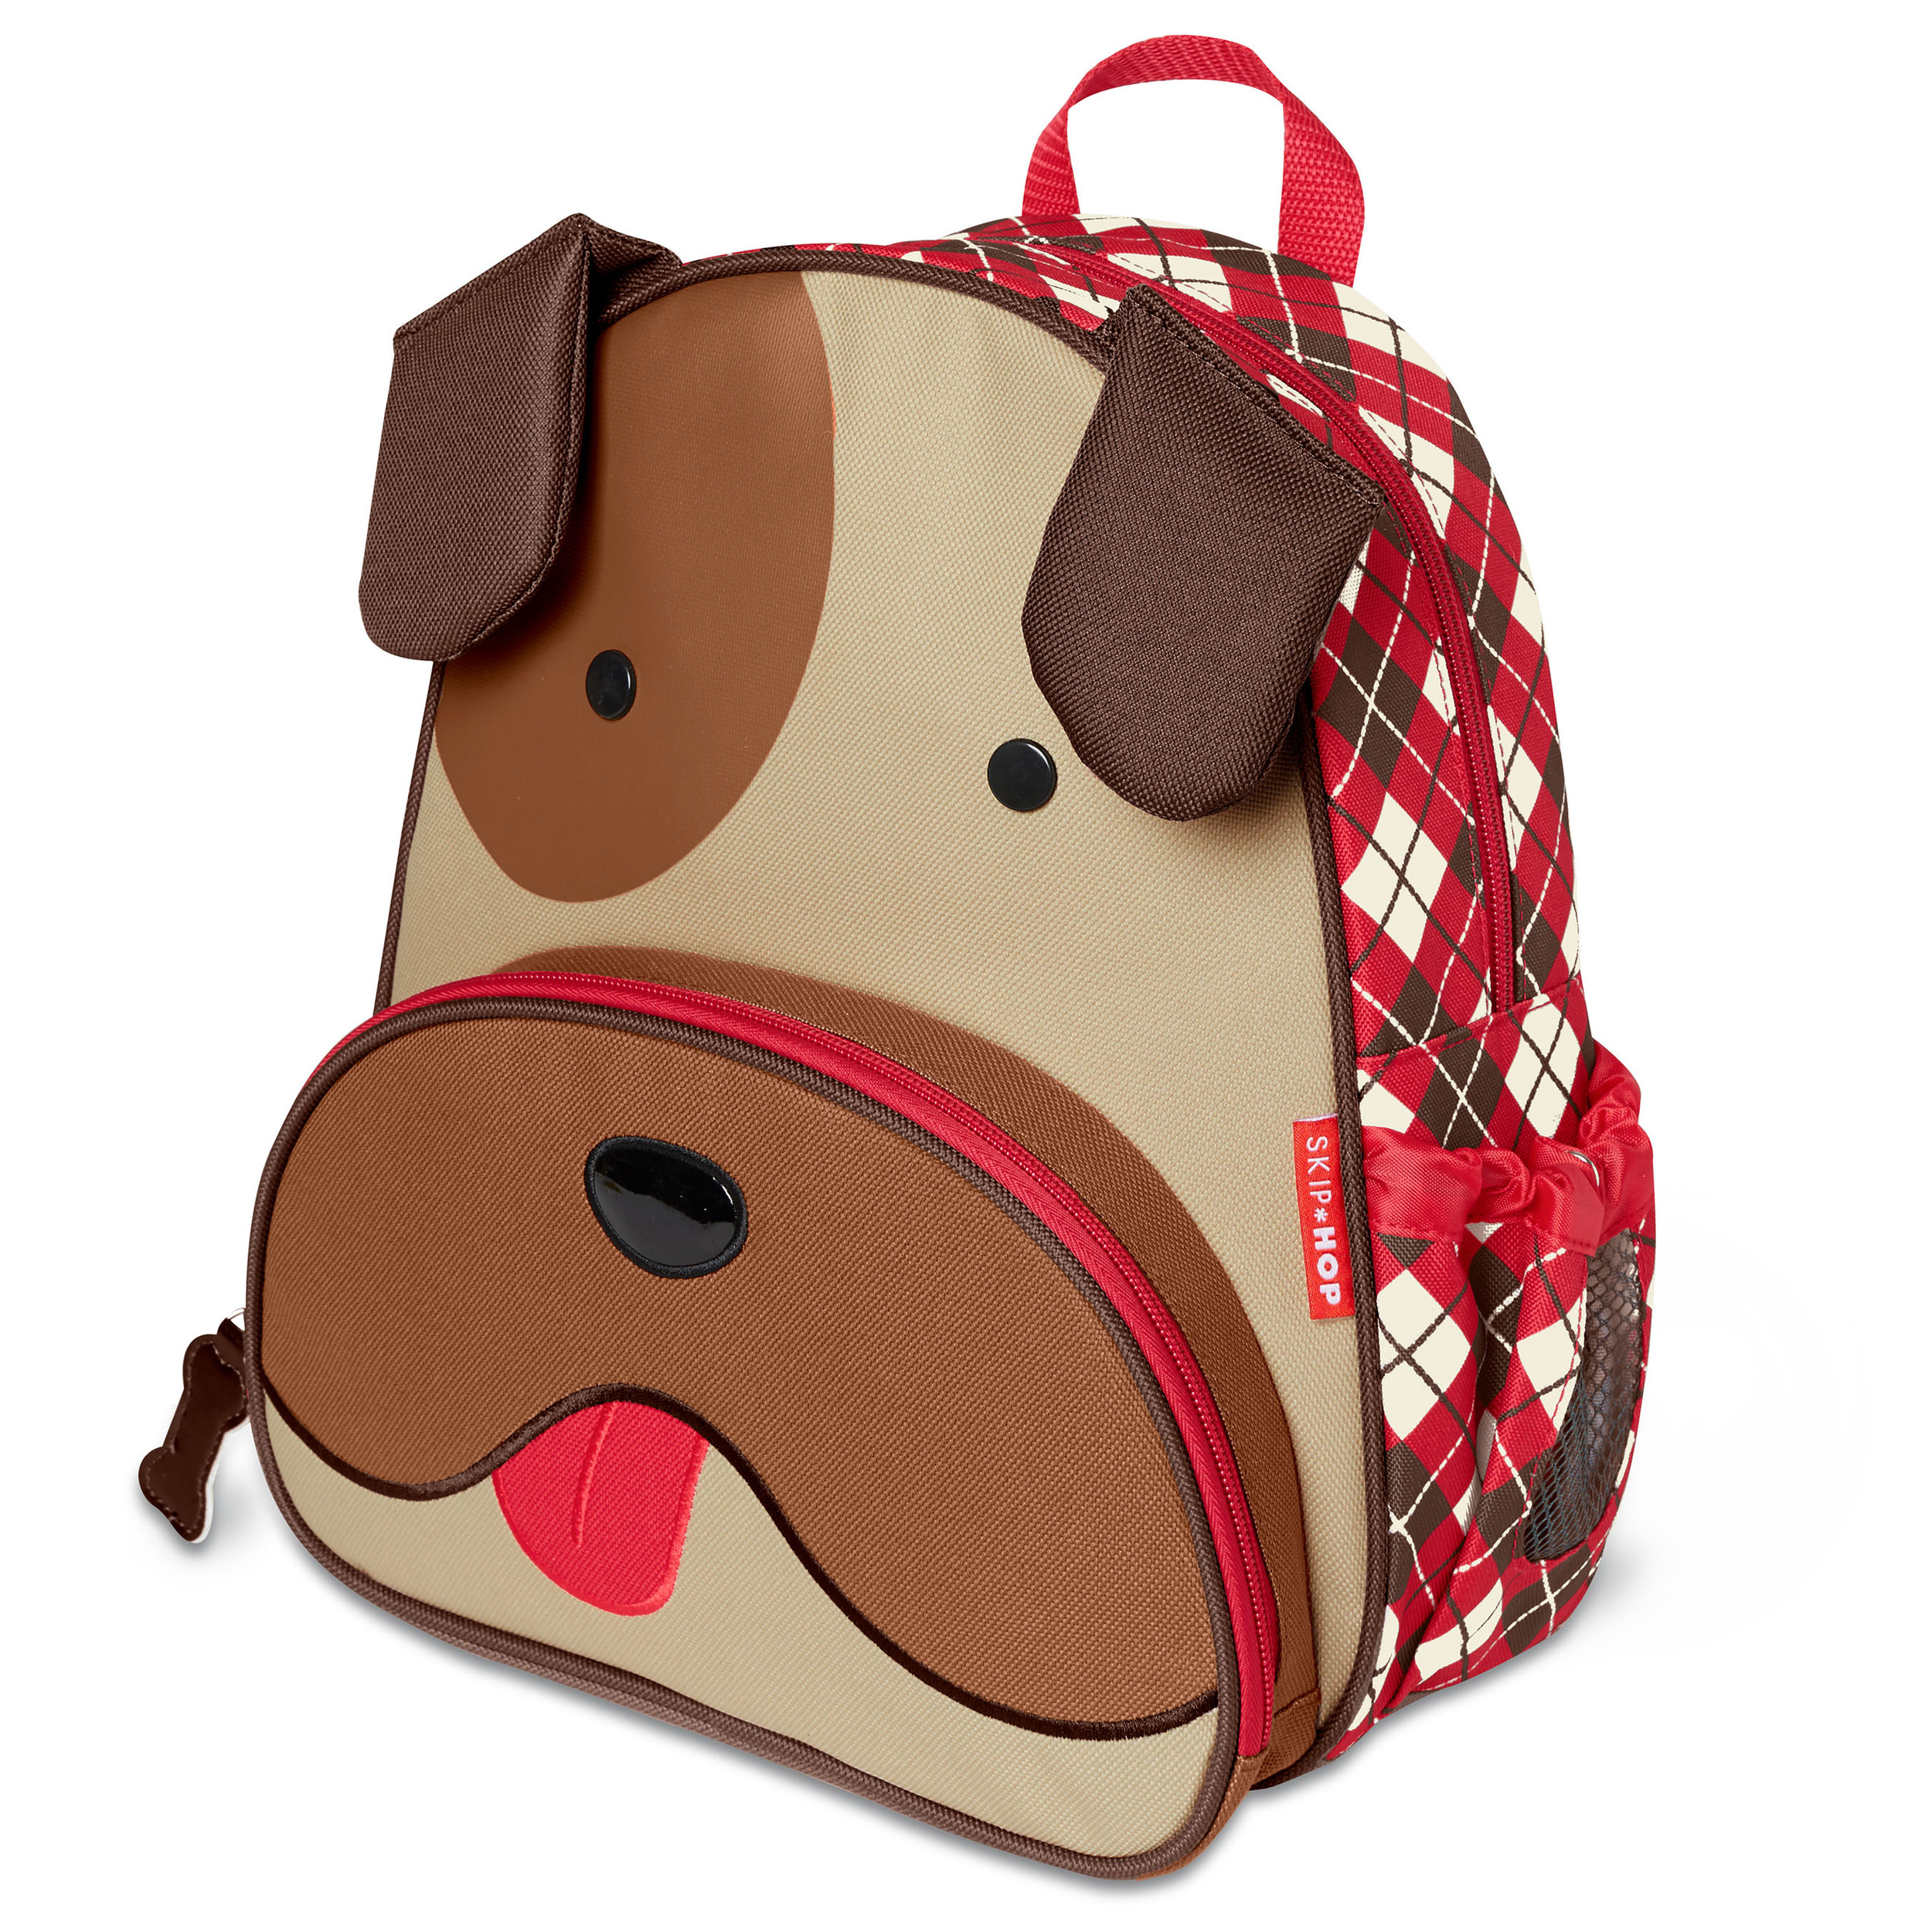 01_Zoo_Pack_Bulldog_212505_(2700).jpg